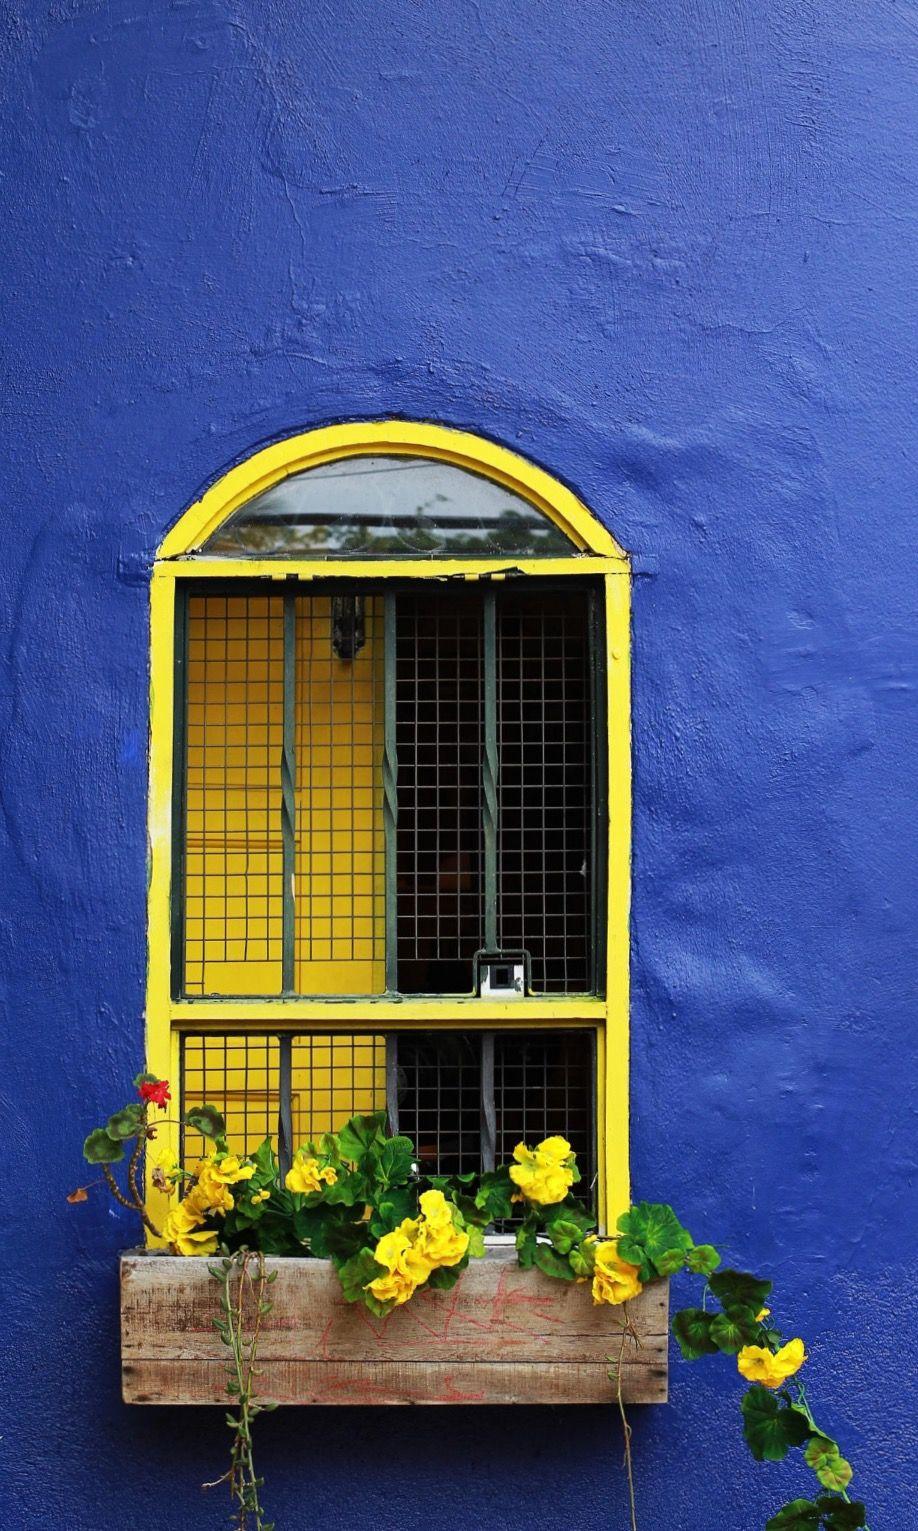 Brazil Nice Yellow Window Blue Wall Contrast Architecture Amp Artifacts Windows Windows